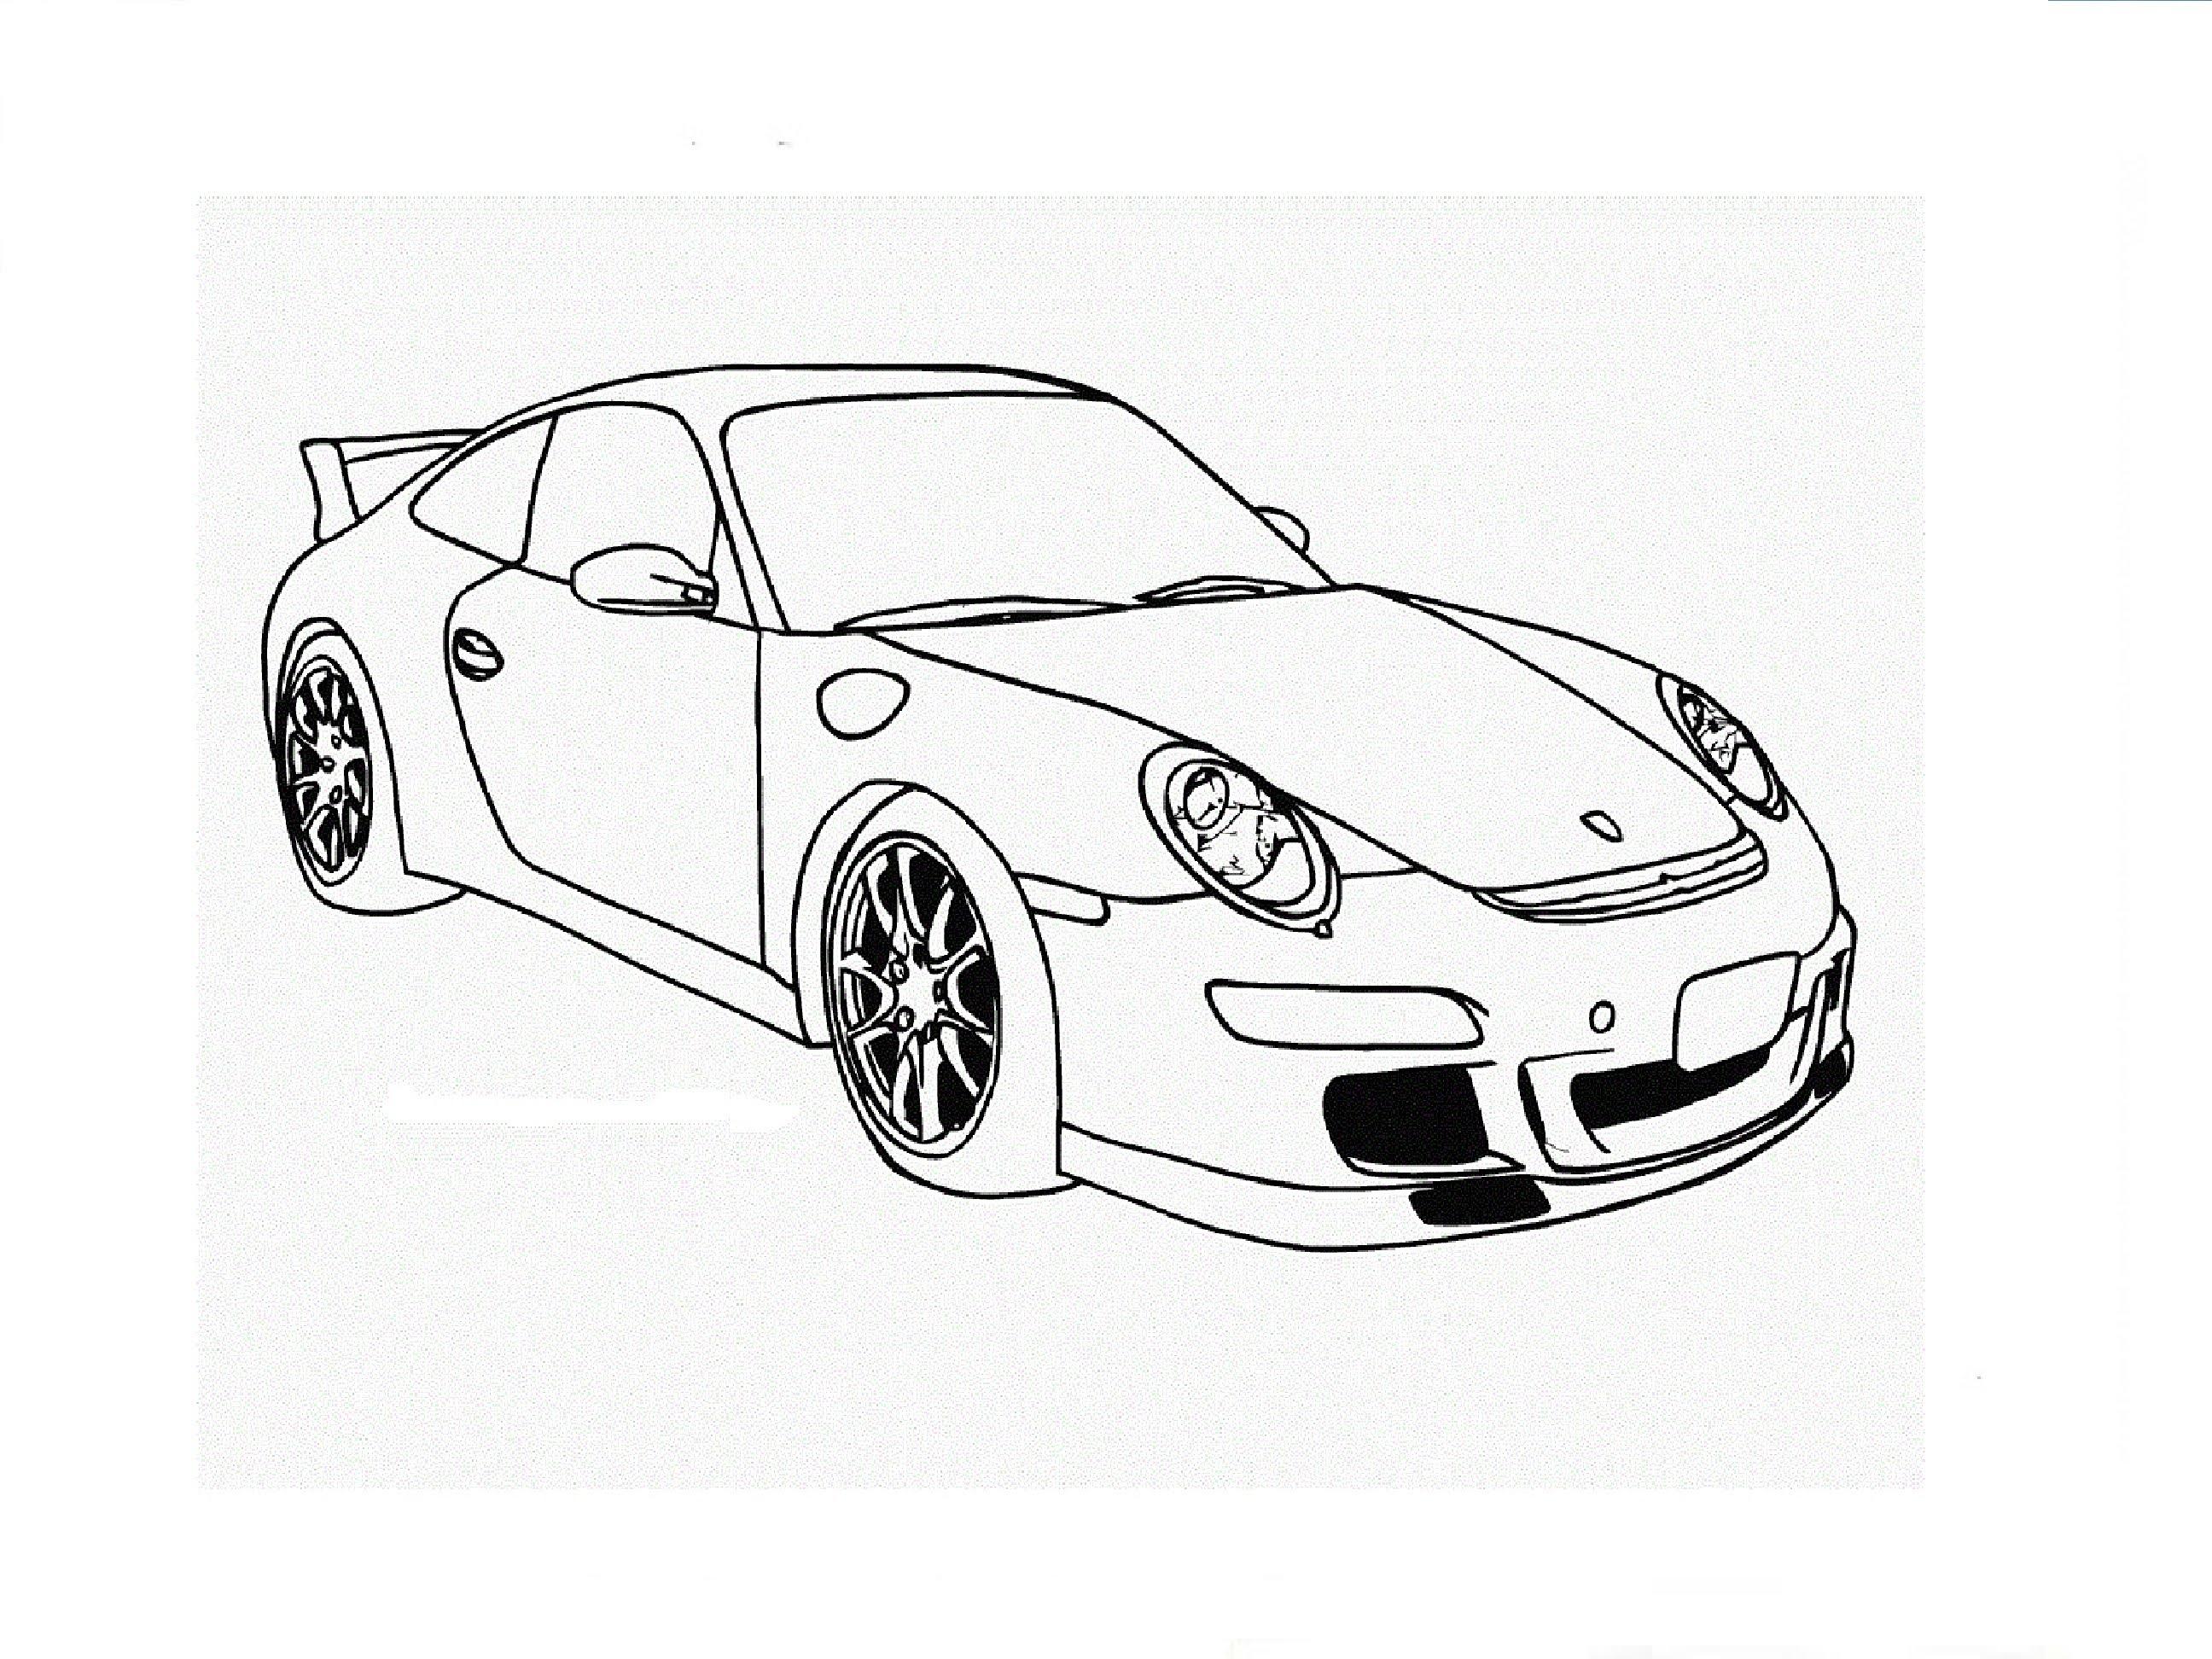 porsche 911 drawing at getdrawings com